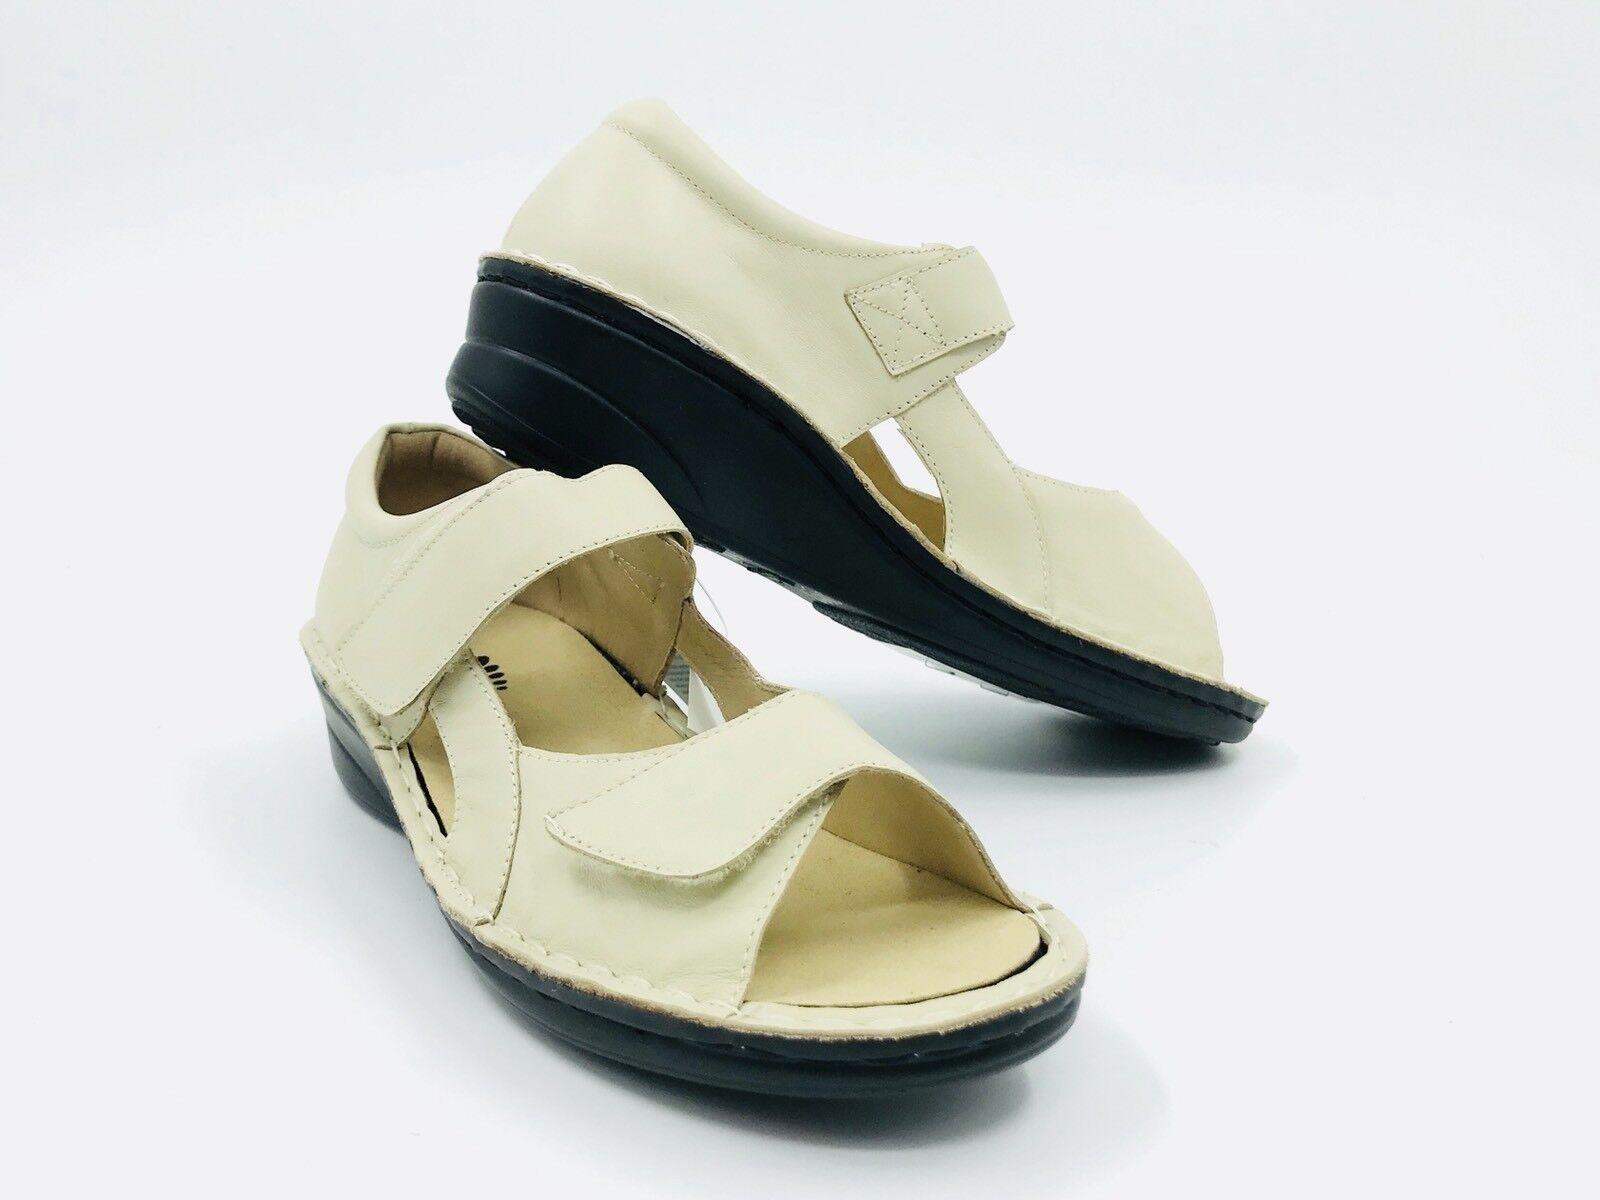 Spring Step entregarse Beige Cuero Sandalia para mujer Talla 39 8.5